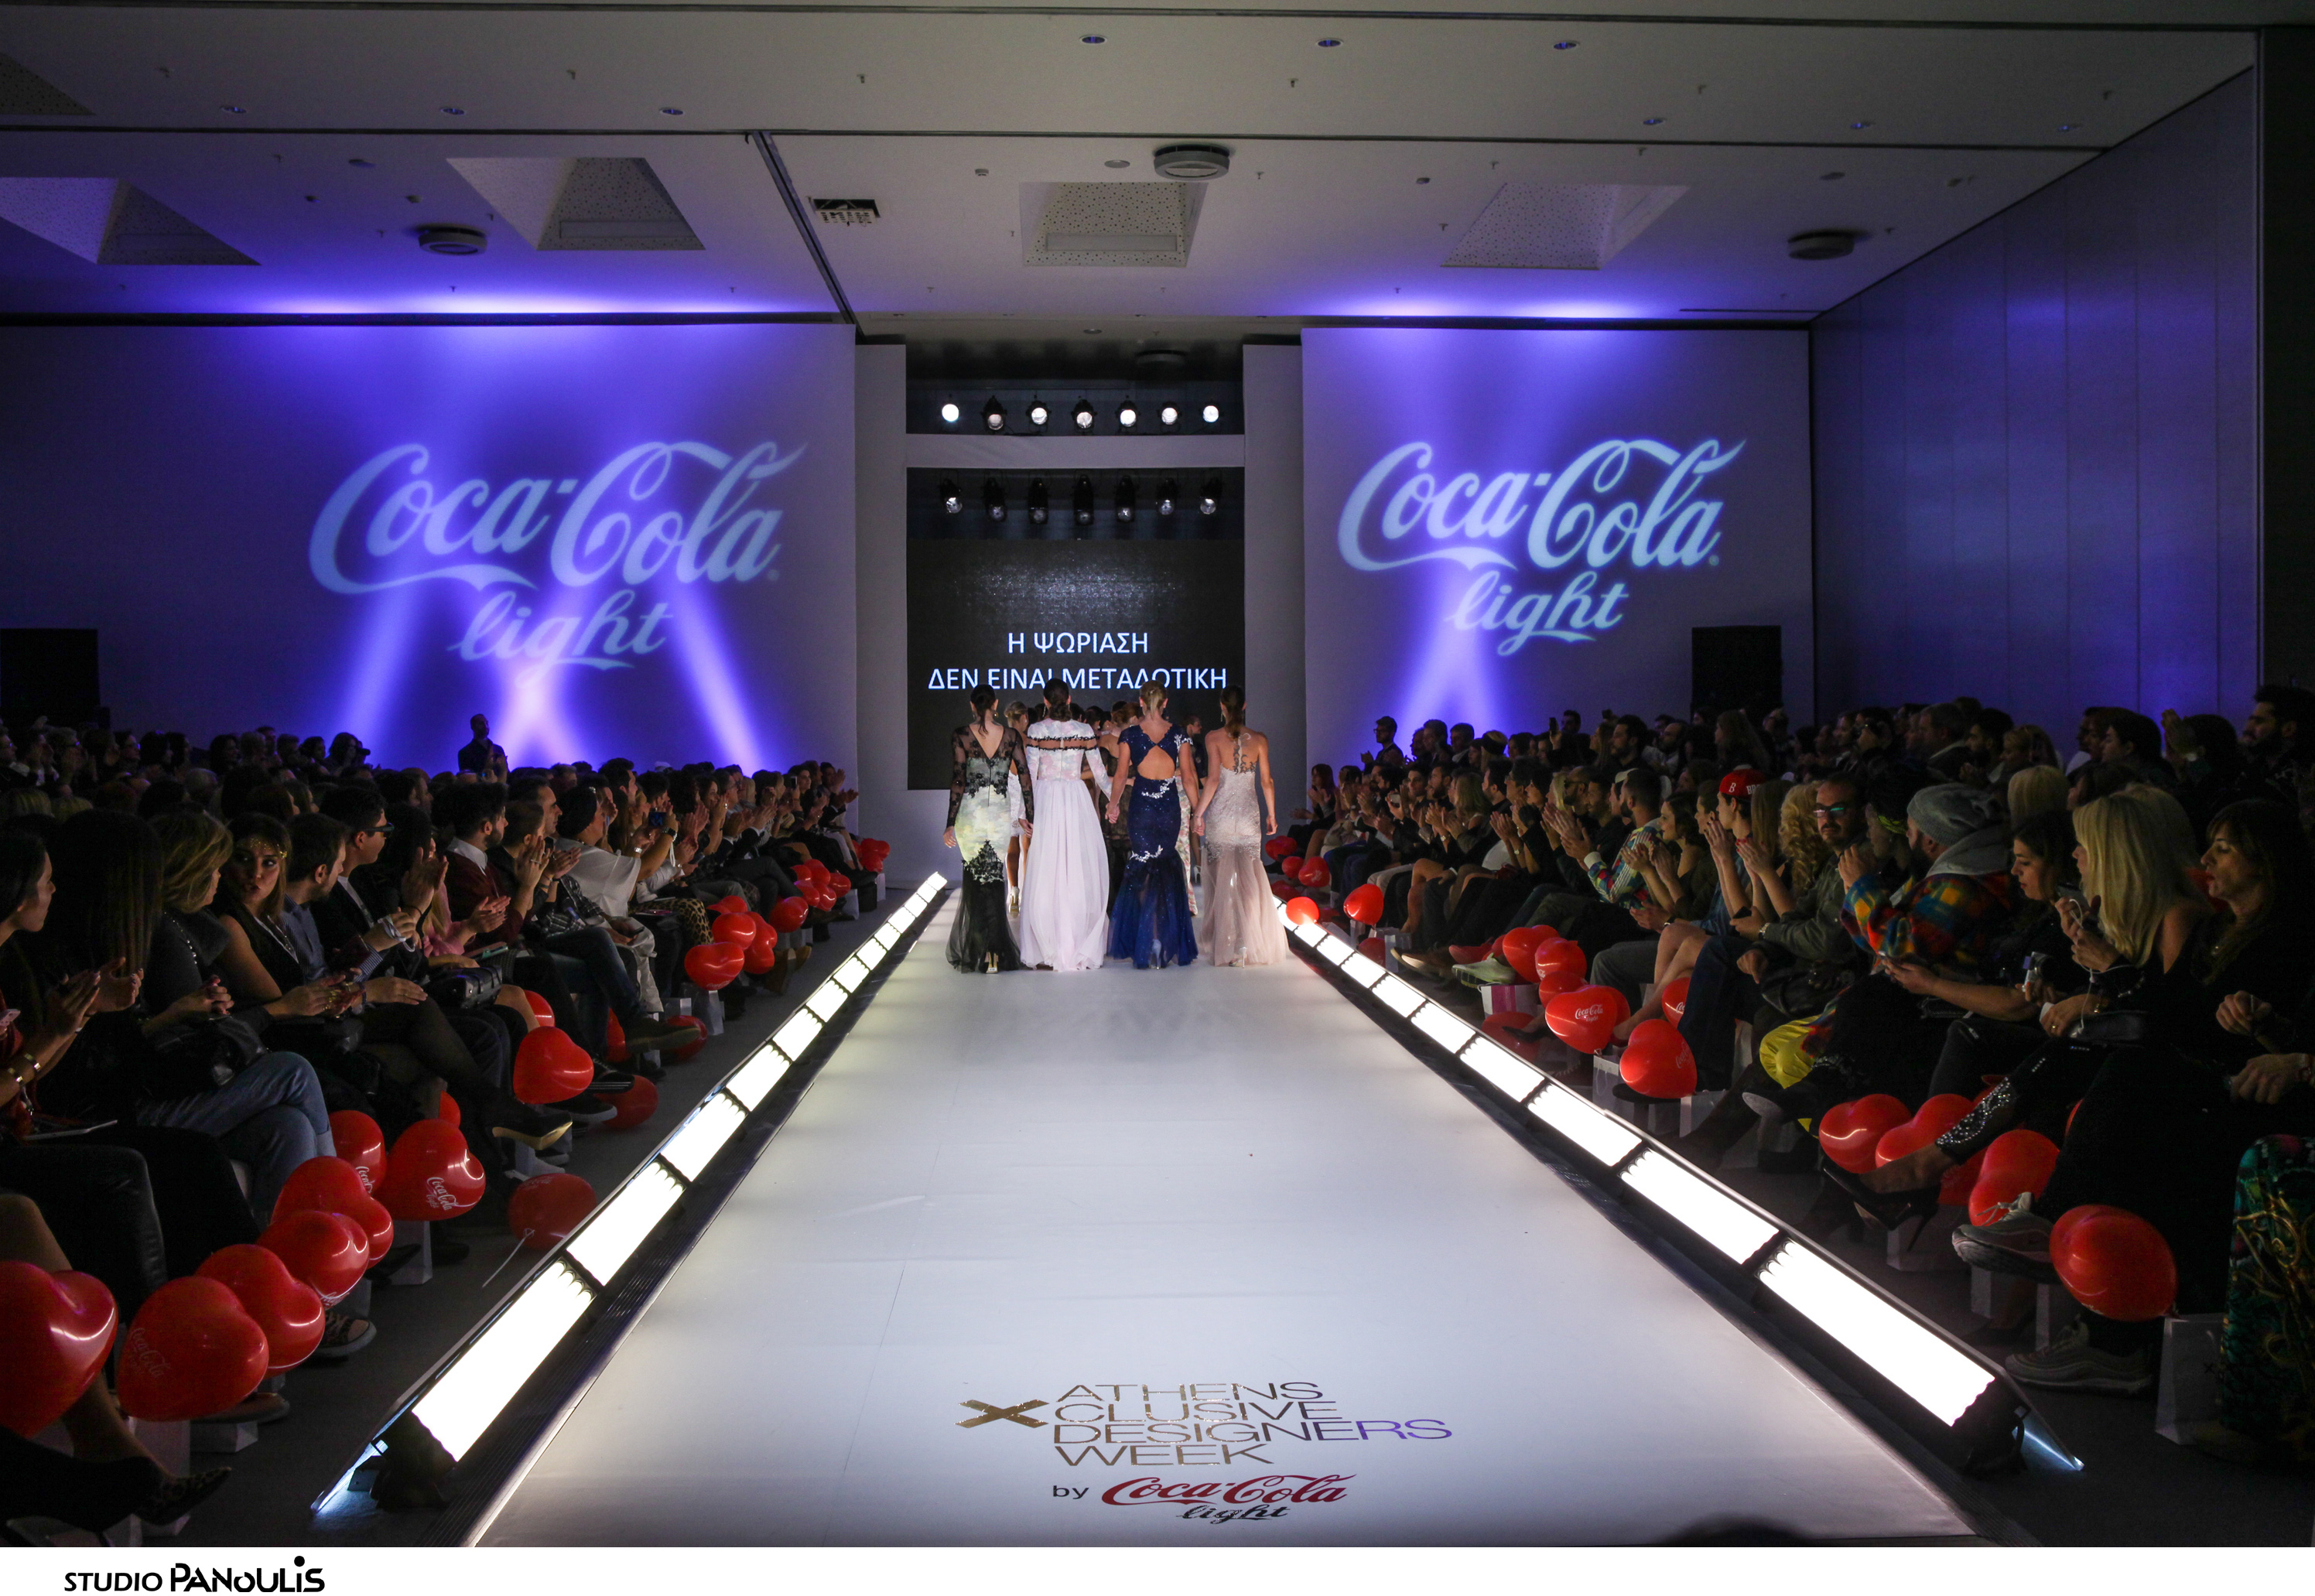 16ç Athens Xclusive Designers Week by Coca-Cola light - 2ç çìÝñá (ÄÔ)